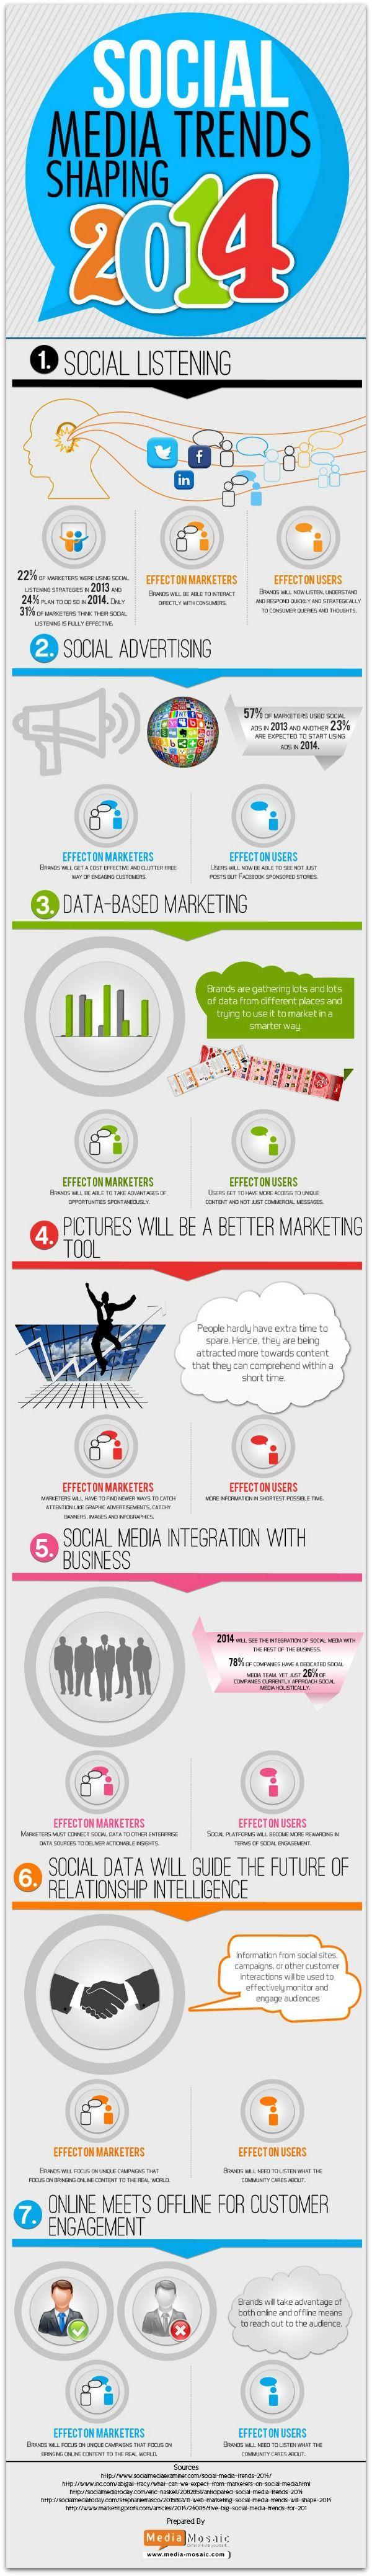 Infographie 117 - 7 social media trends 2014